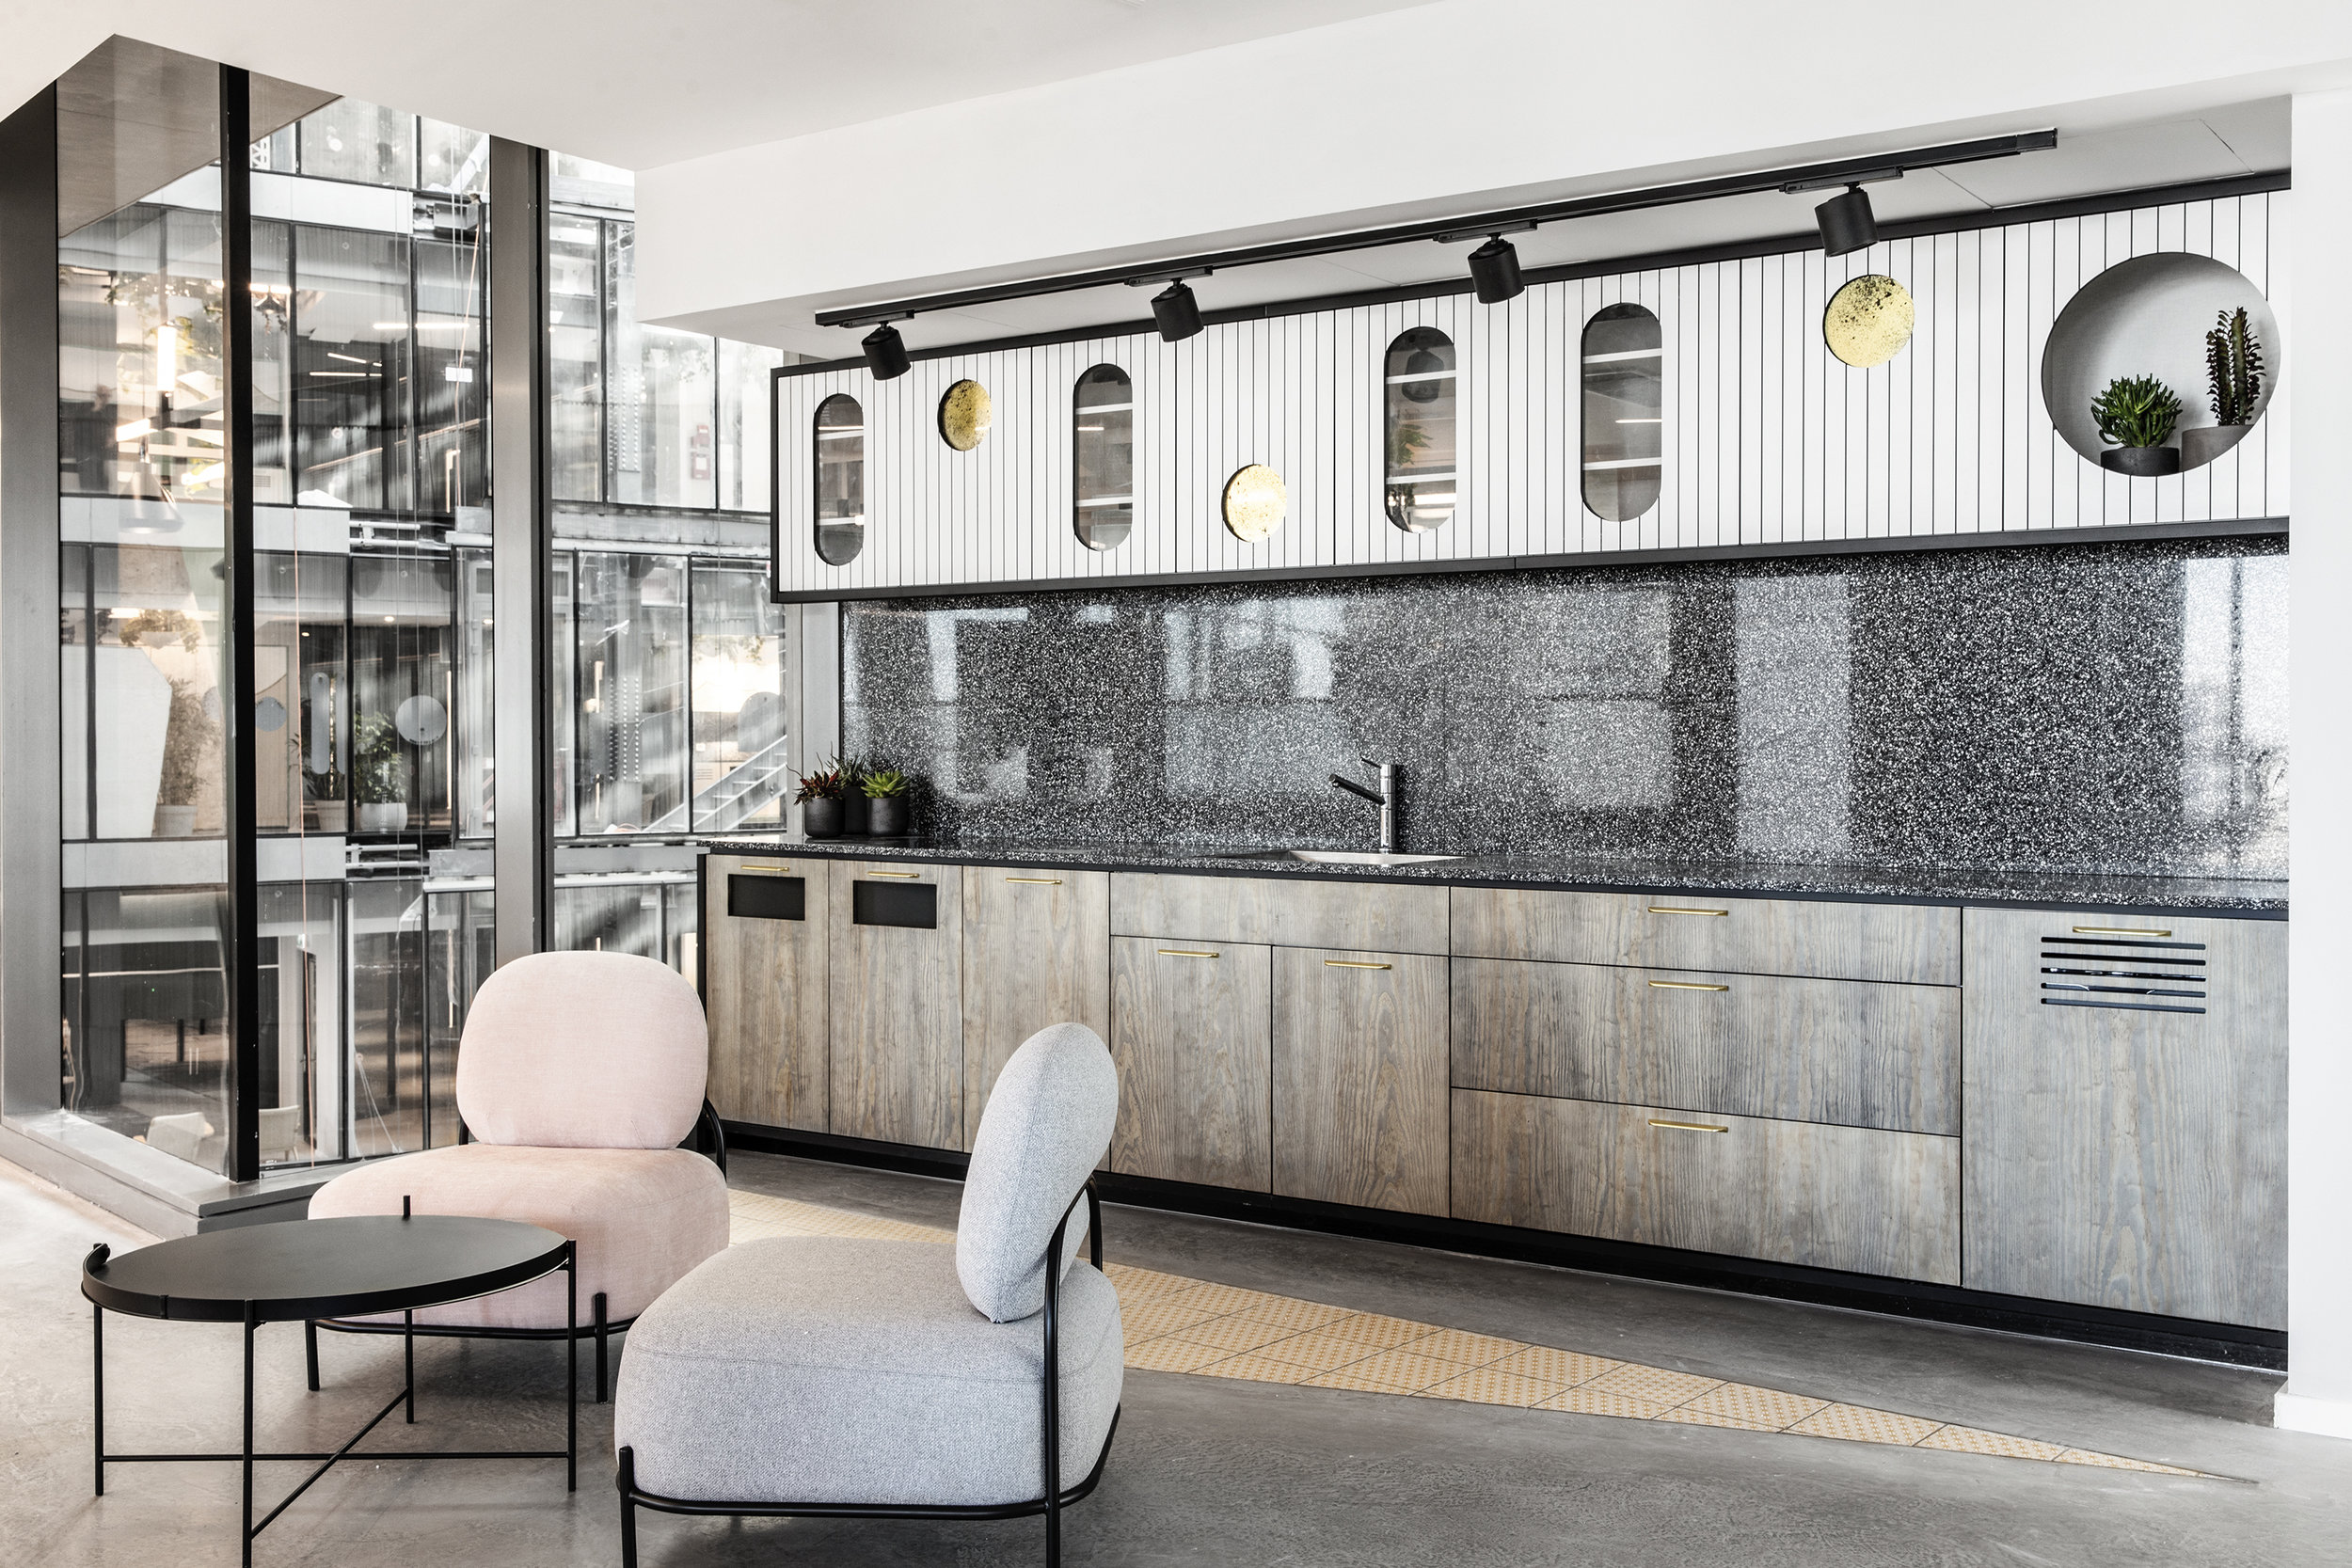 רואי דוד אדריכלות - אדריכל - נטורל אינטליג'נס - ROY DAVID - ARCHITECTURE - ARCHITECT - NI (78).jpg